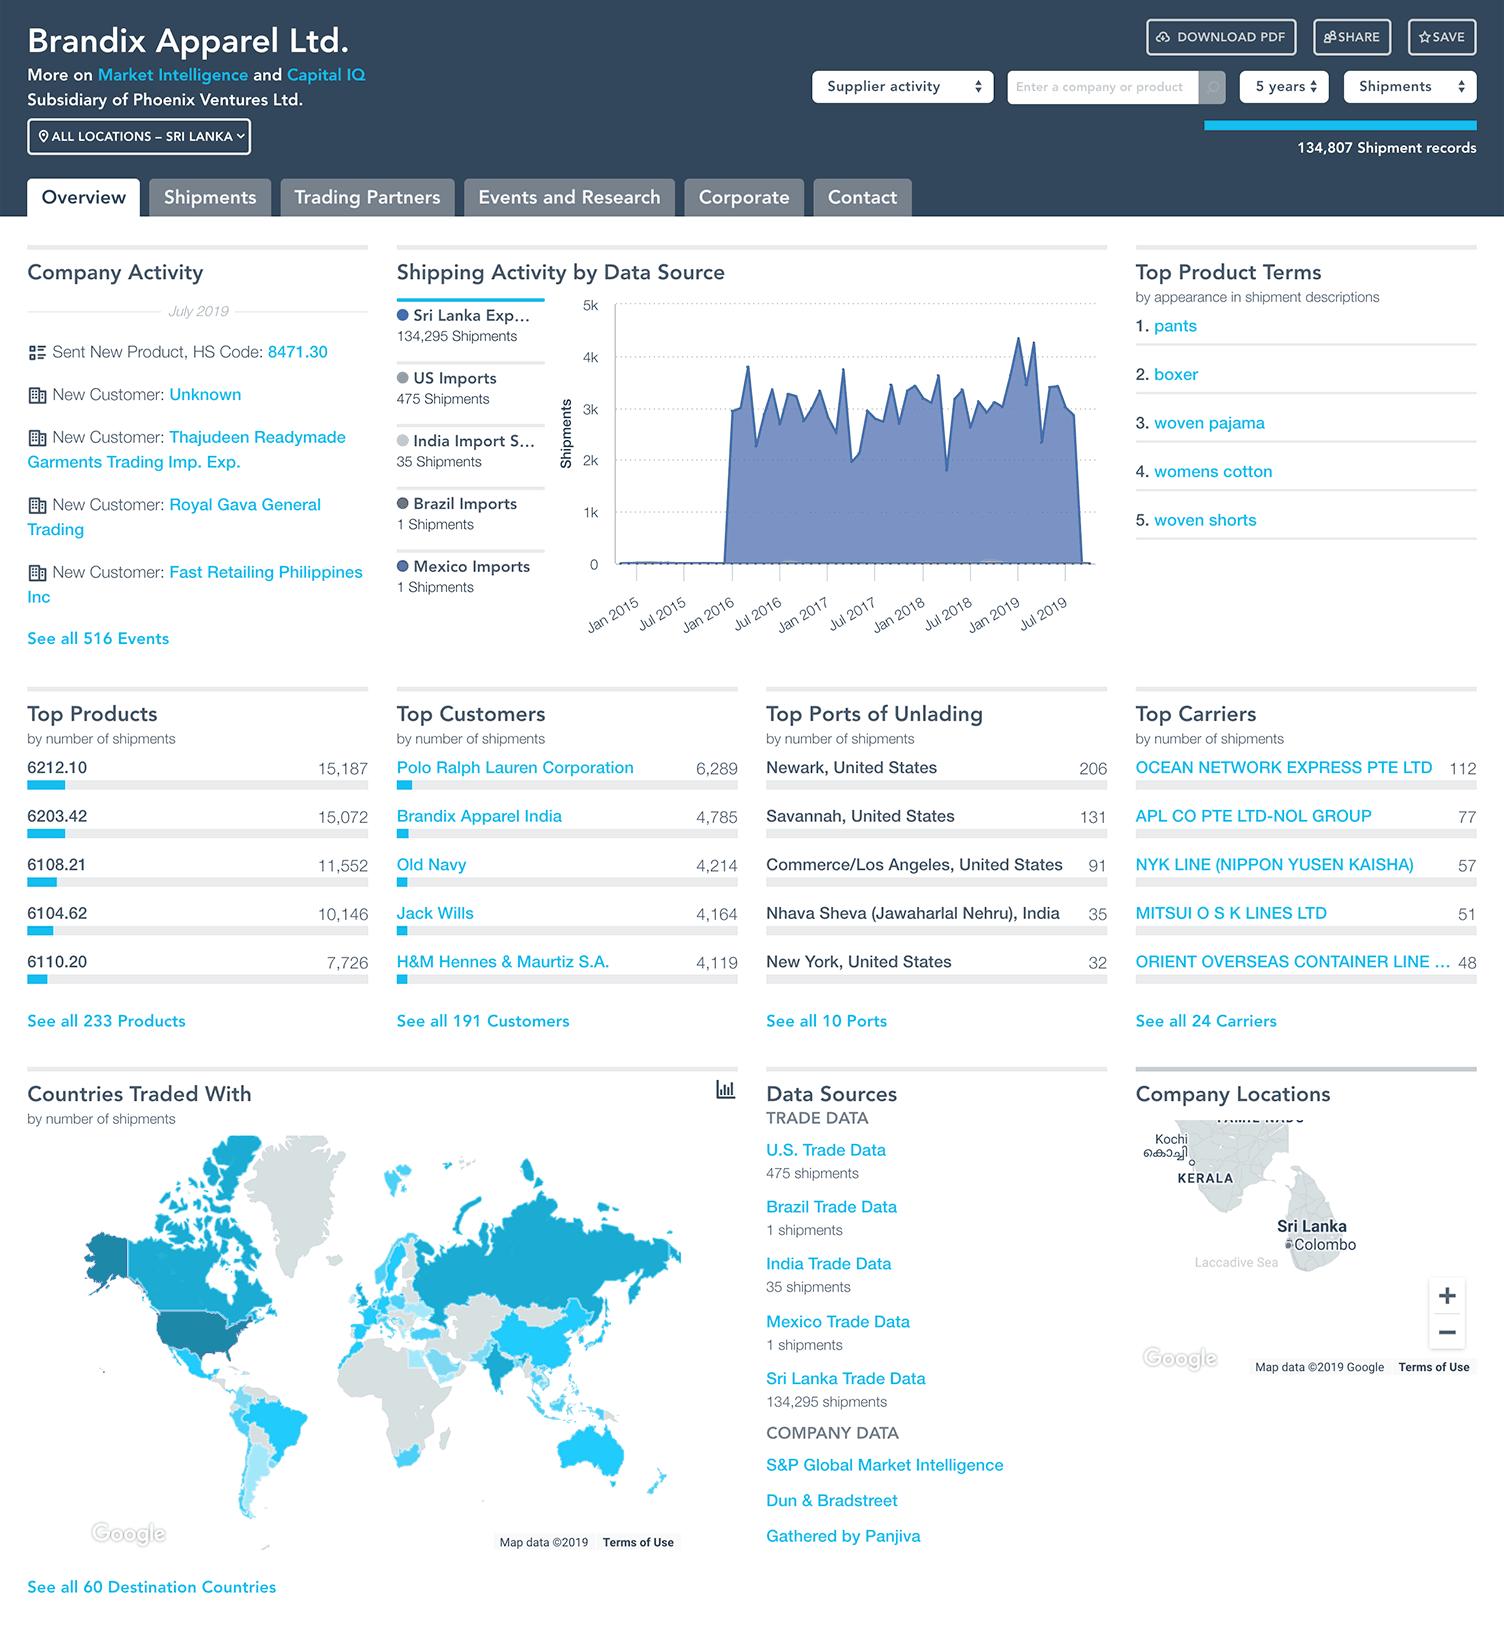 Company profile with Sri Lanka shipping records